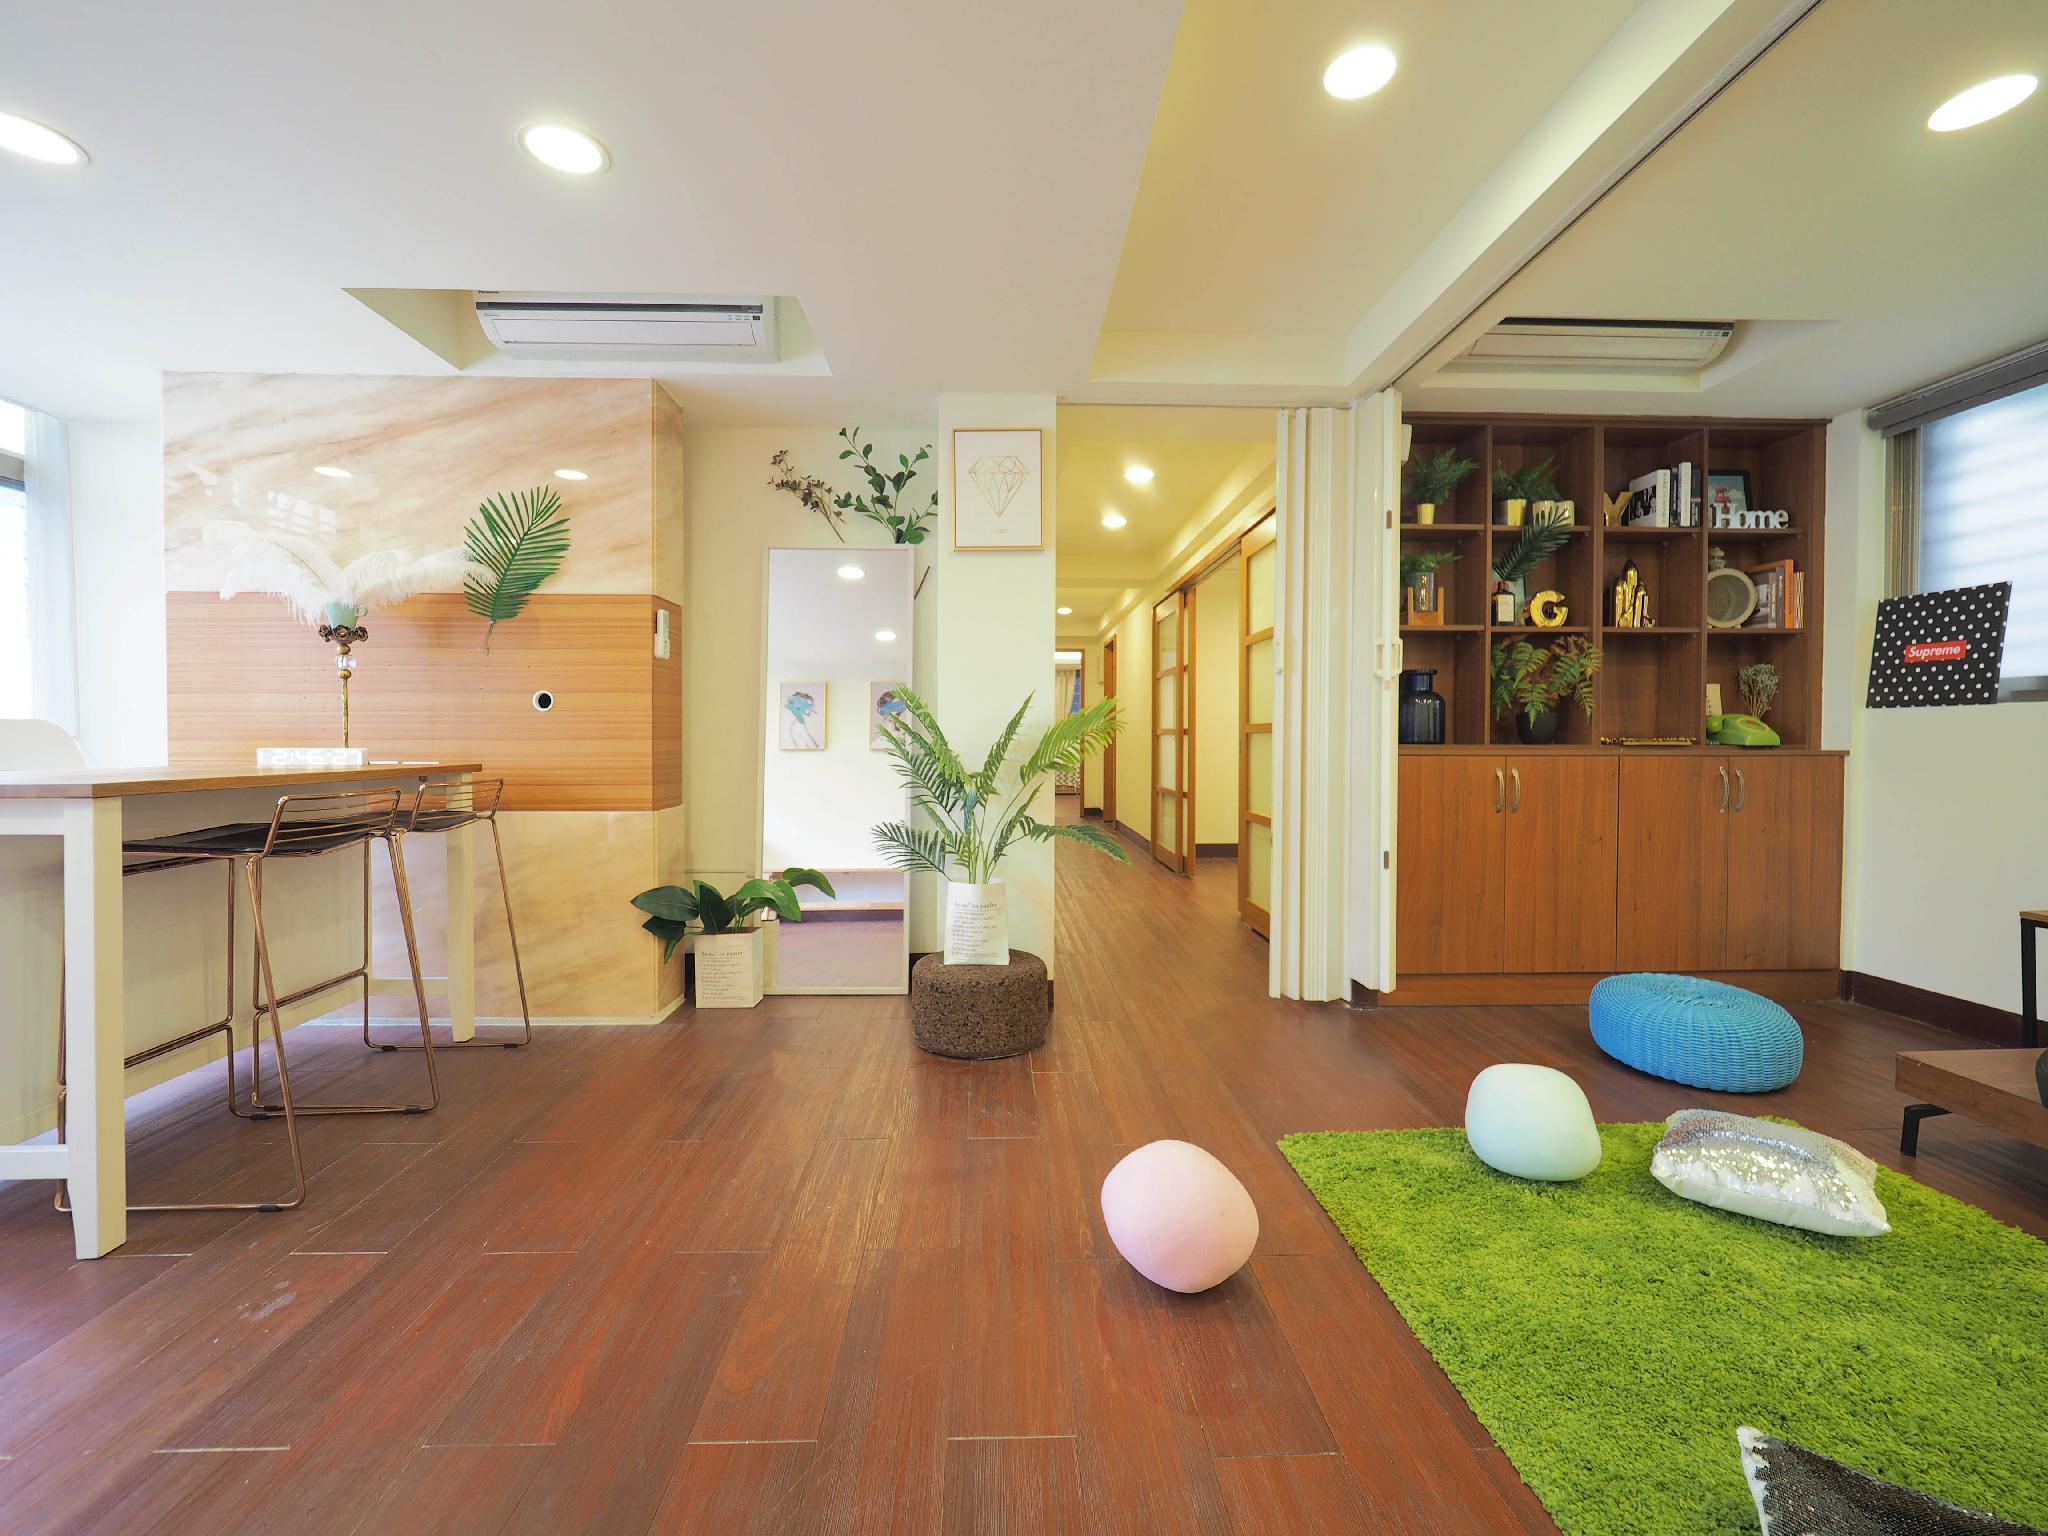 SHARE HOUSE.C TechnologyBuilding MRT 5mins2PPL